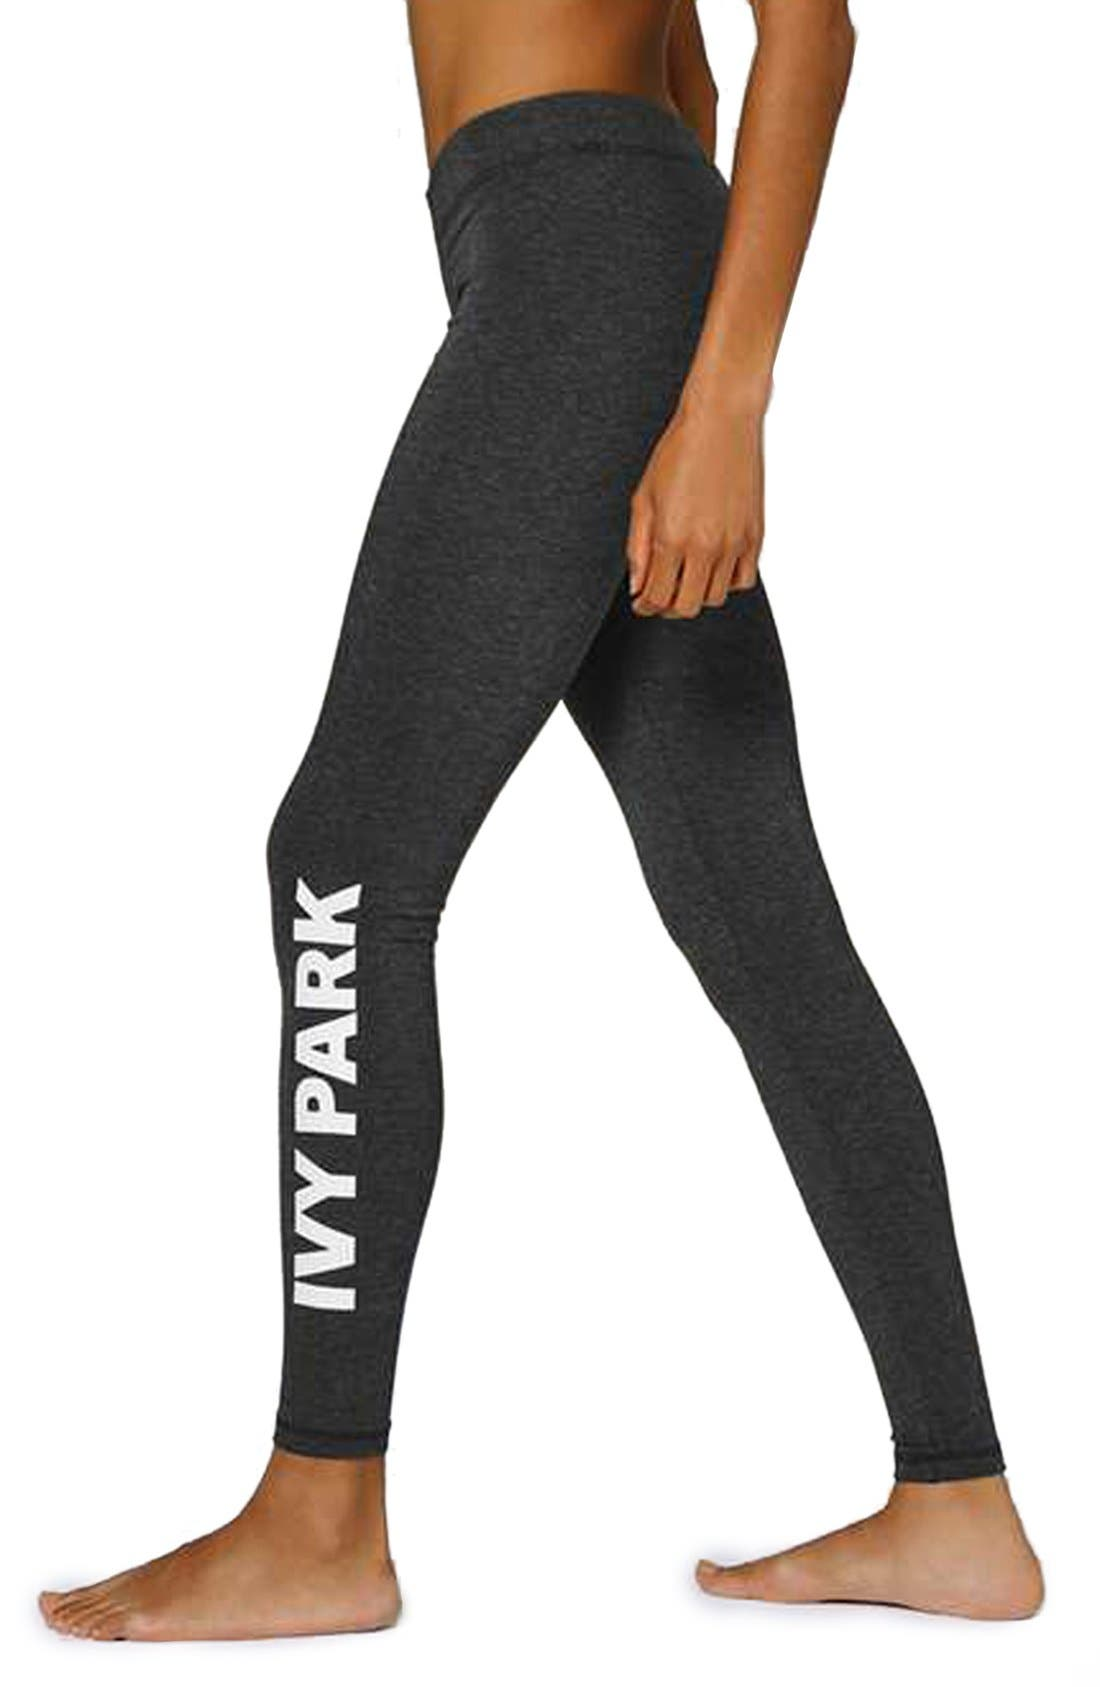 Alternate Image 1 Selected - IVY PARK® Logo Ankle Leggings